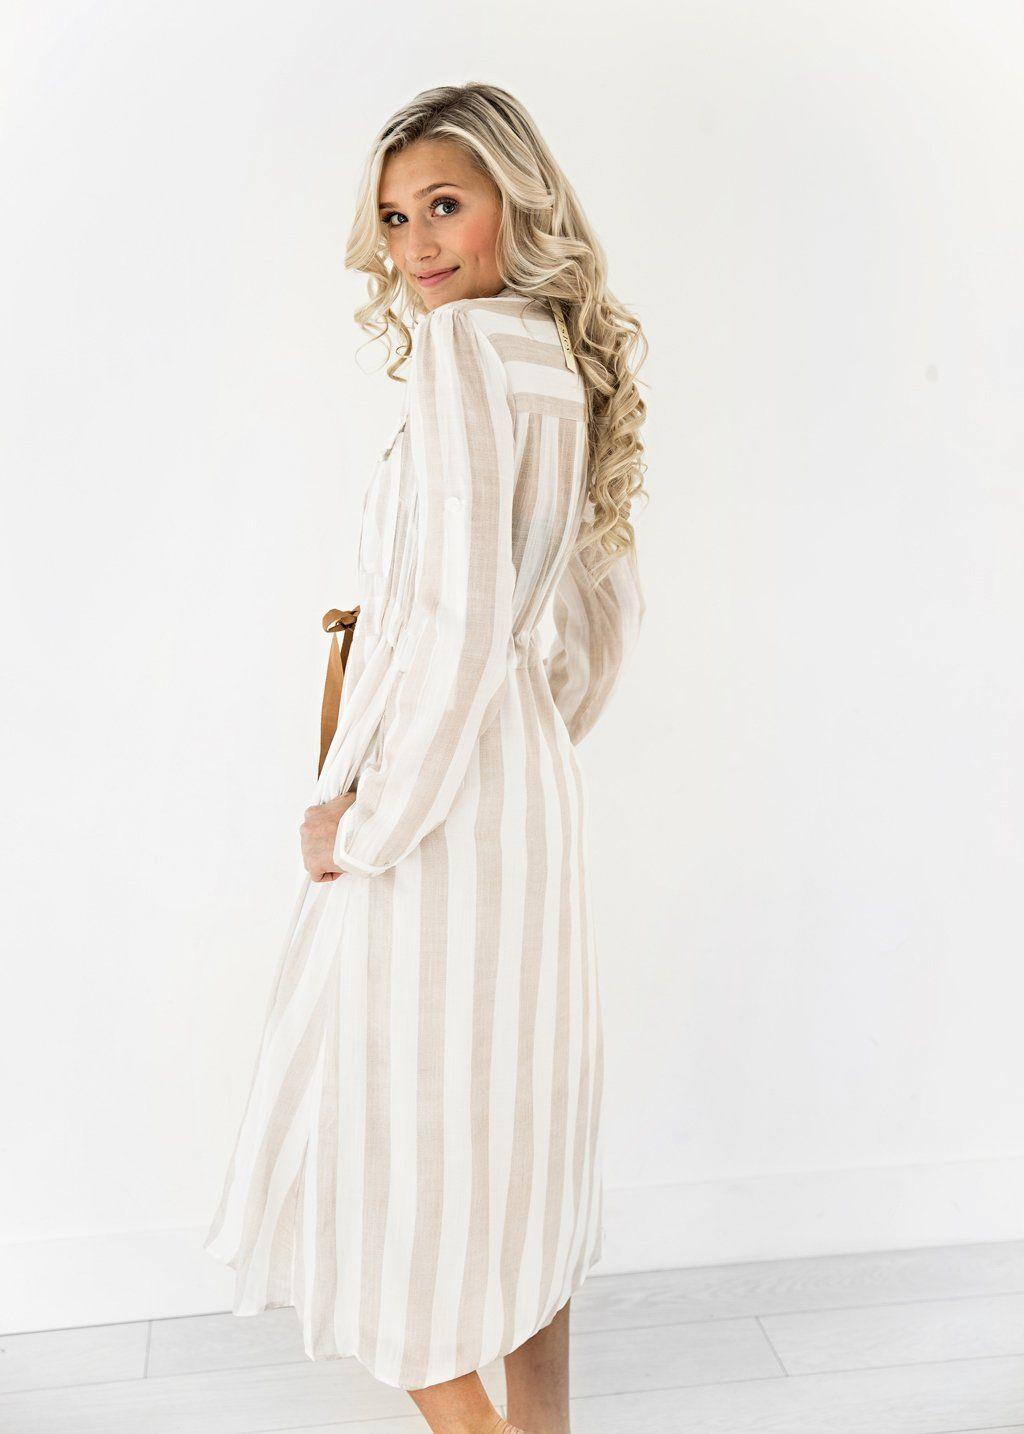 Picnic Striped Dress Jessakae New Arrivals Striped Dress Pocket Detail Womens Fashion Womens Style Tan White Beau Dresses Striped Dress Dreamy Dress [ 1434 x 1024 Pixel ]